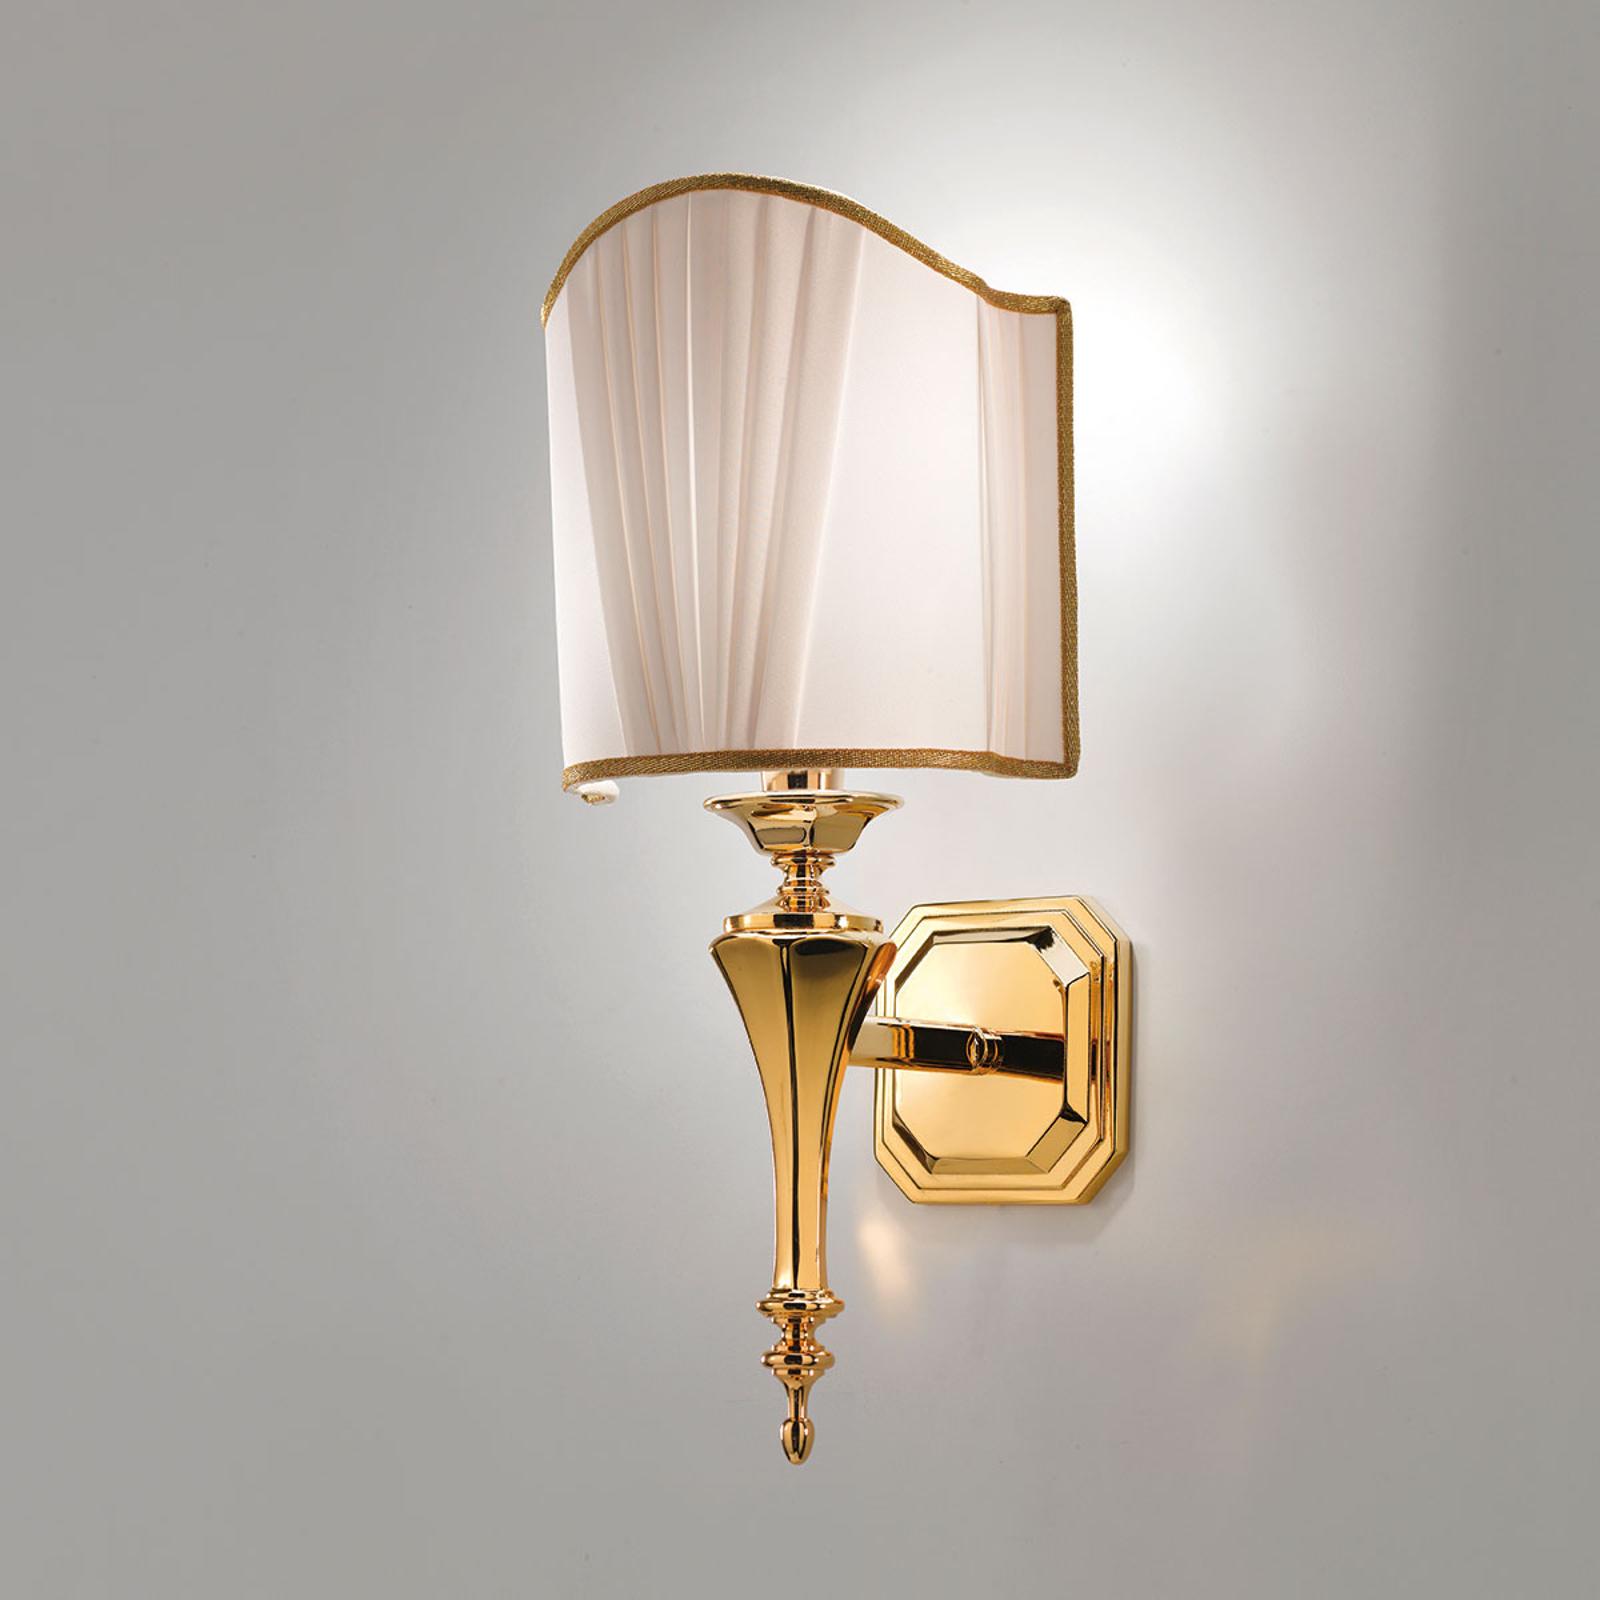 Belle Epoque - szlachetna złota lampa ścienna